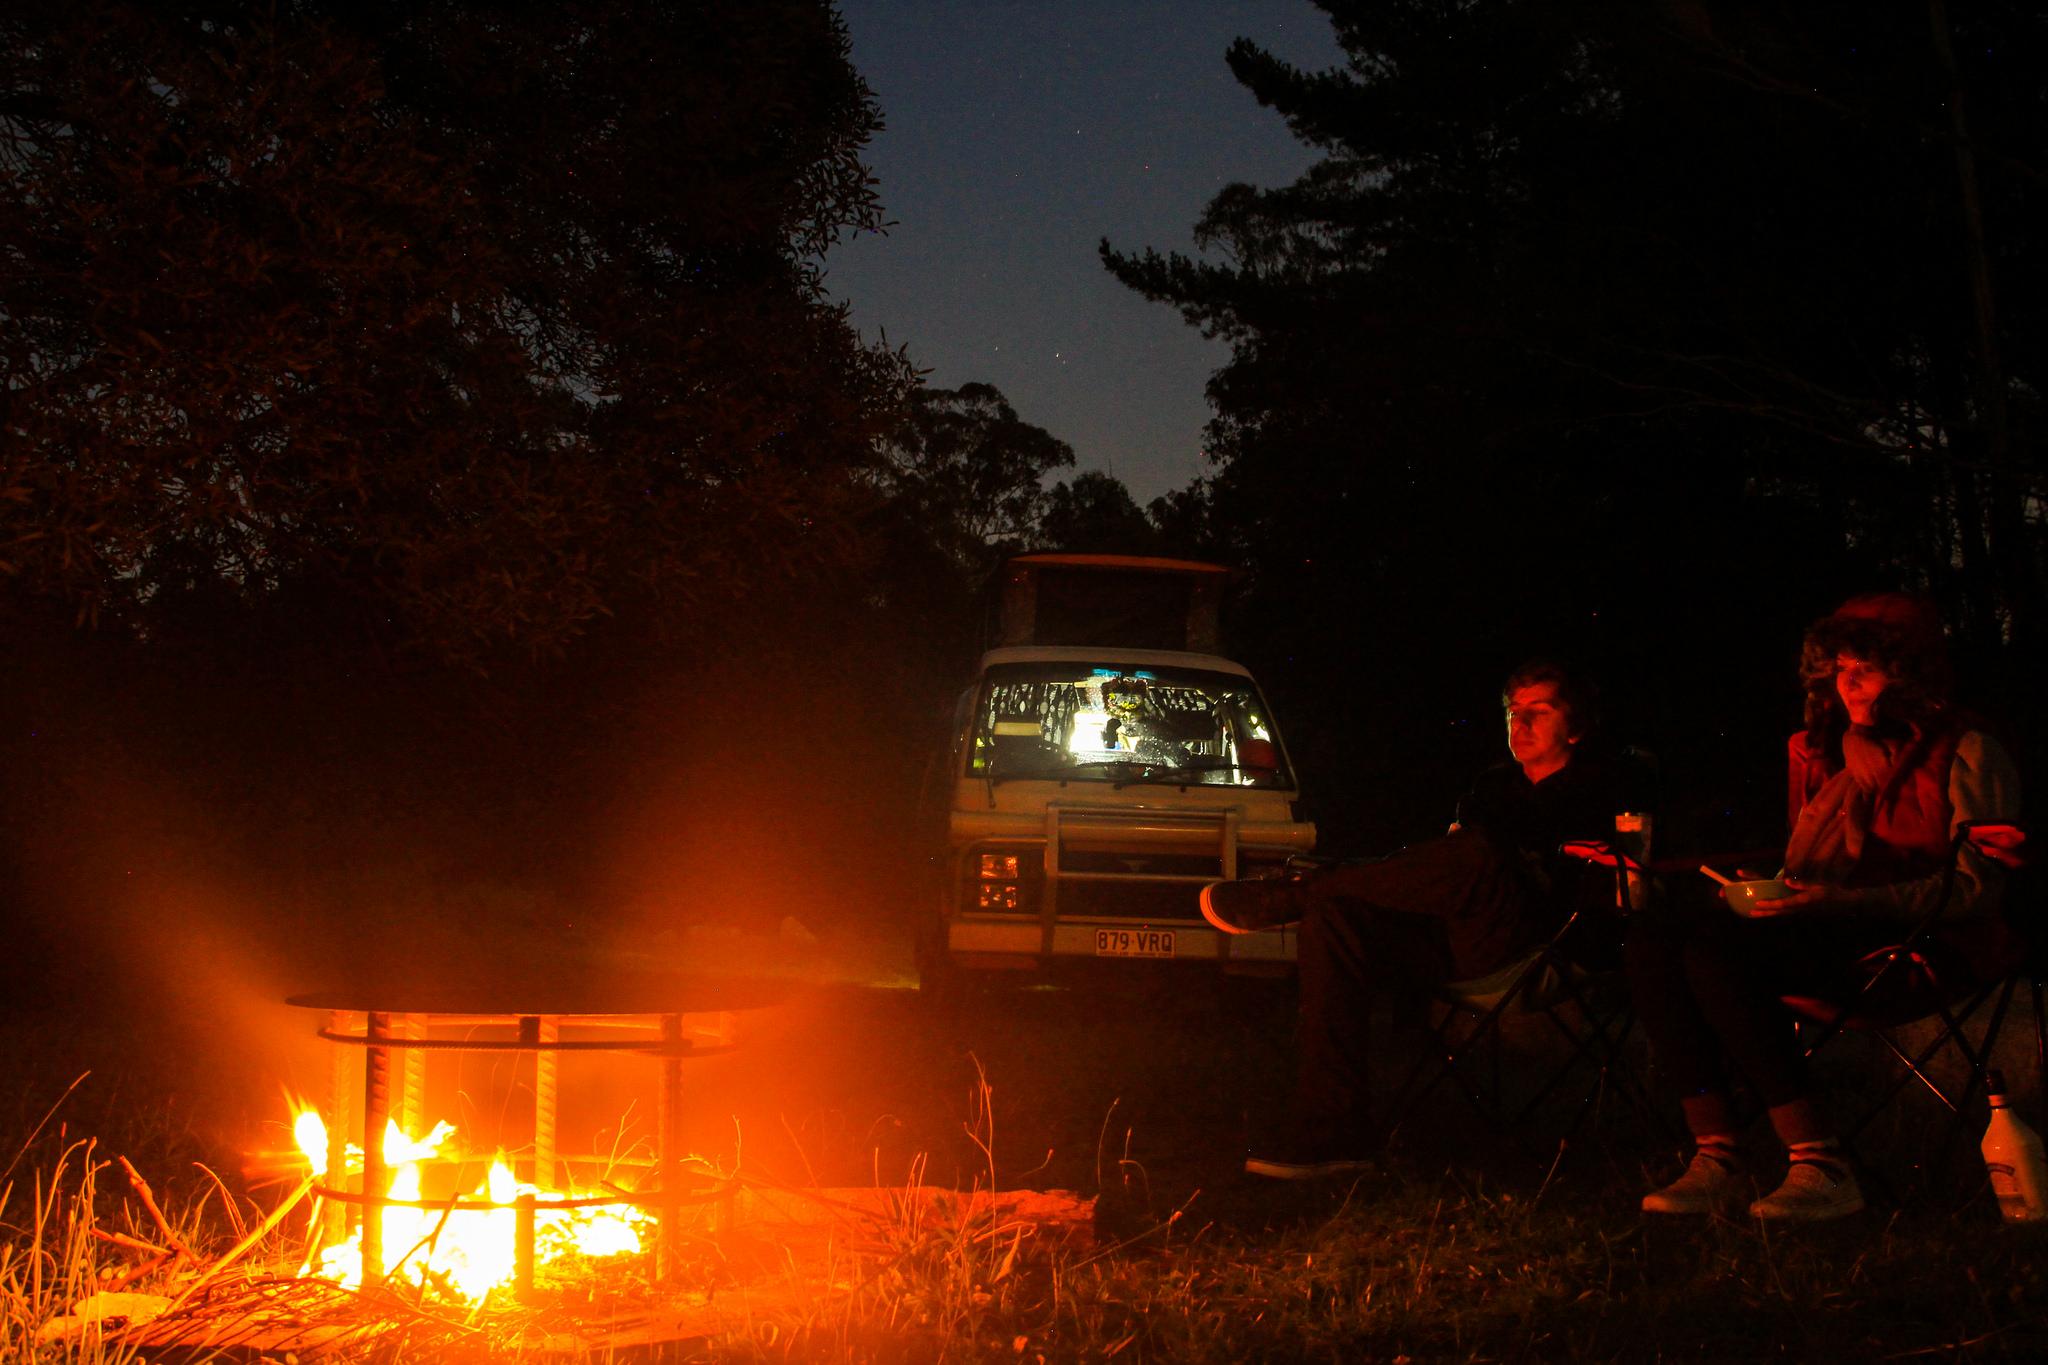 fogueira no acampamento na floresta